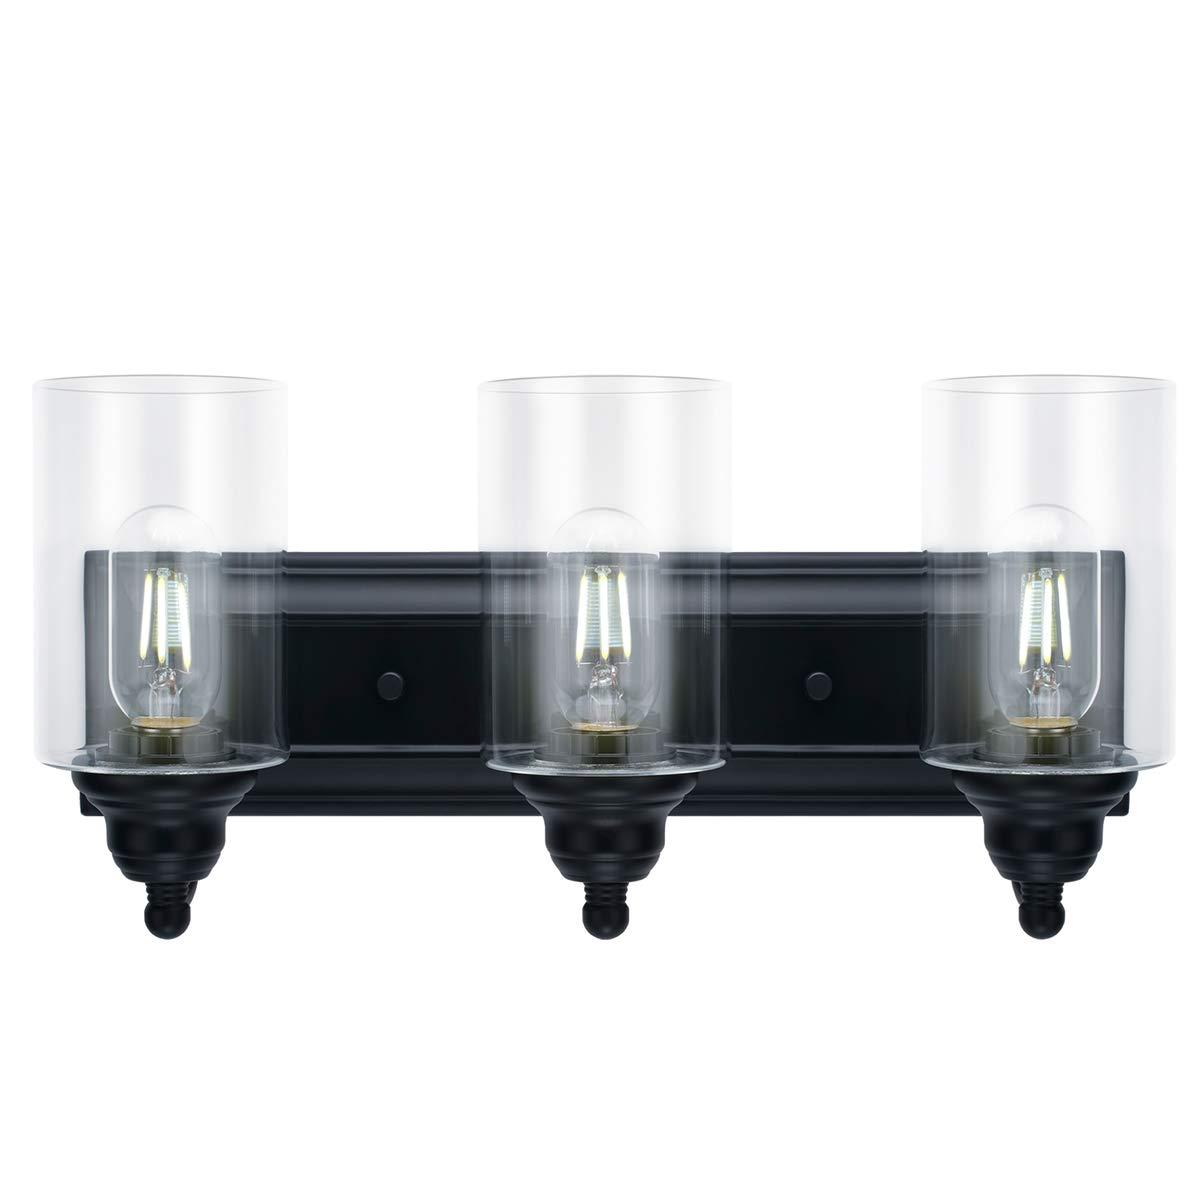 3-Light Vanity Light Fixture Modern Clear Glass Shades Lighting Black Dining Room Lighting Fixtures 3-Light